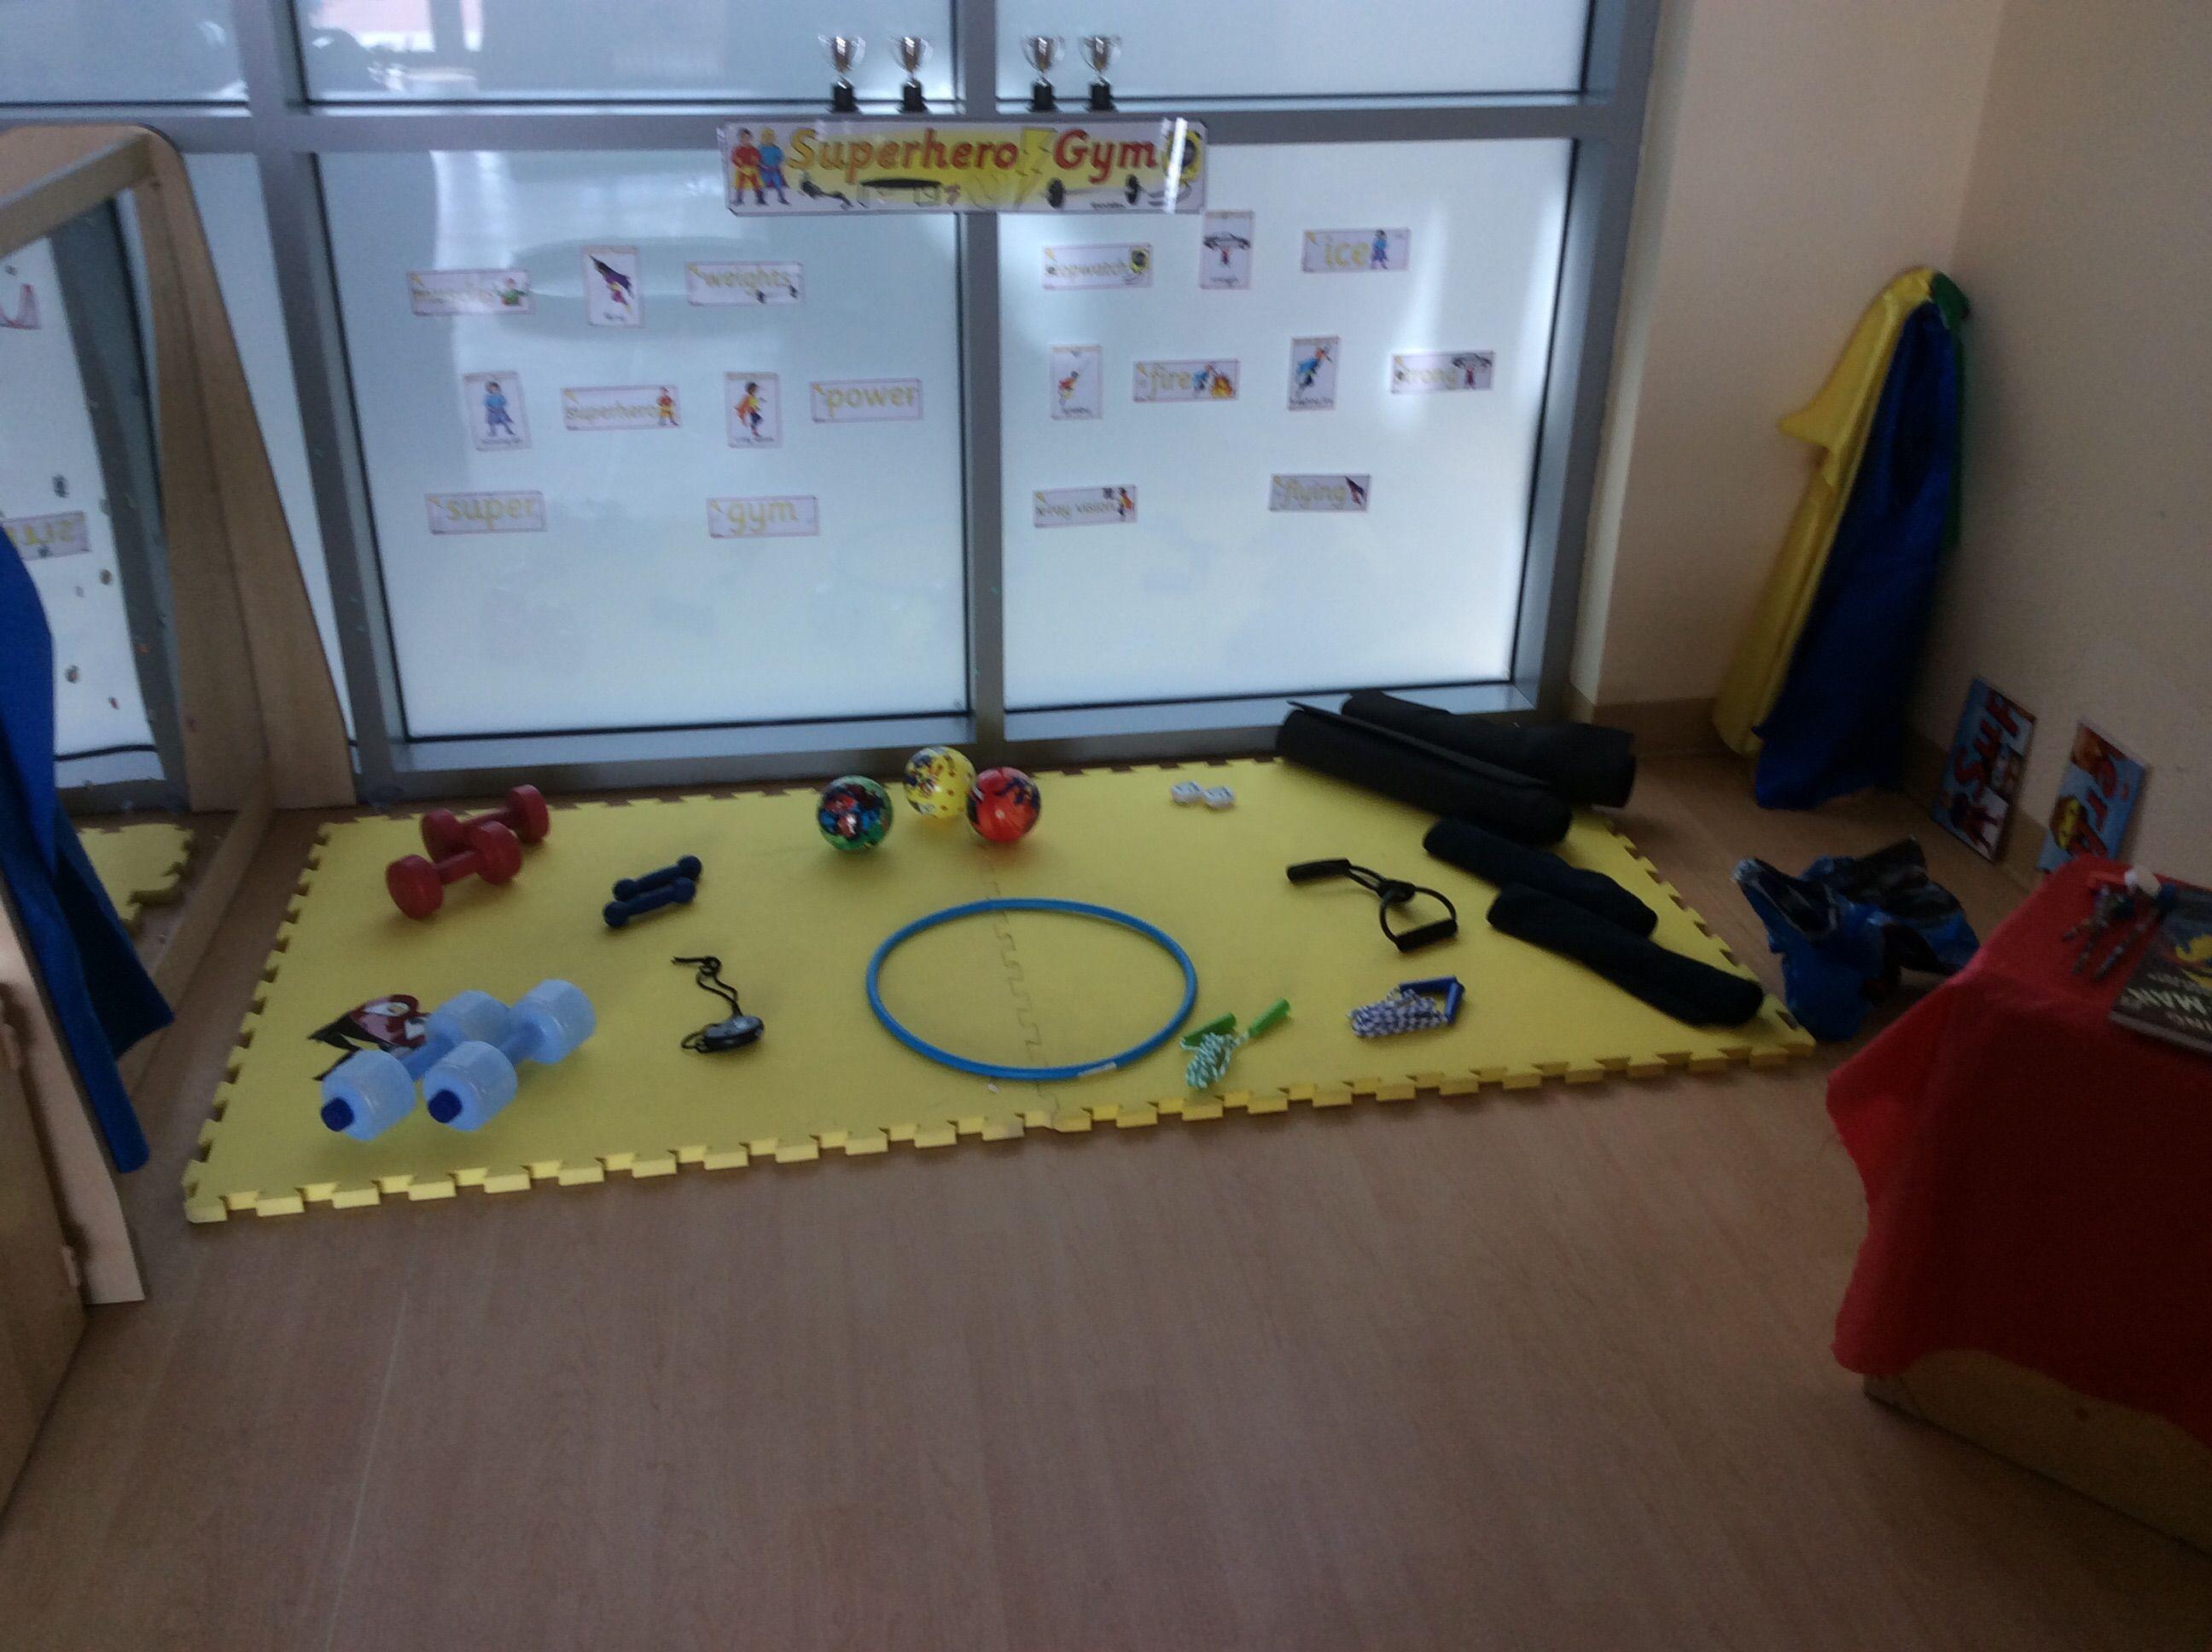 Superhero Gym Role Play Area Eyfs Role Play Areas Role Play Areas Eyfs Dramatic Play Preschool